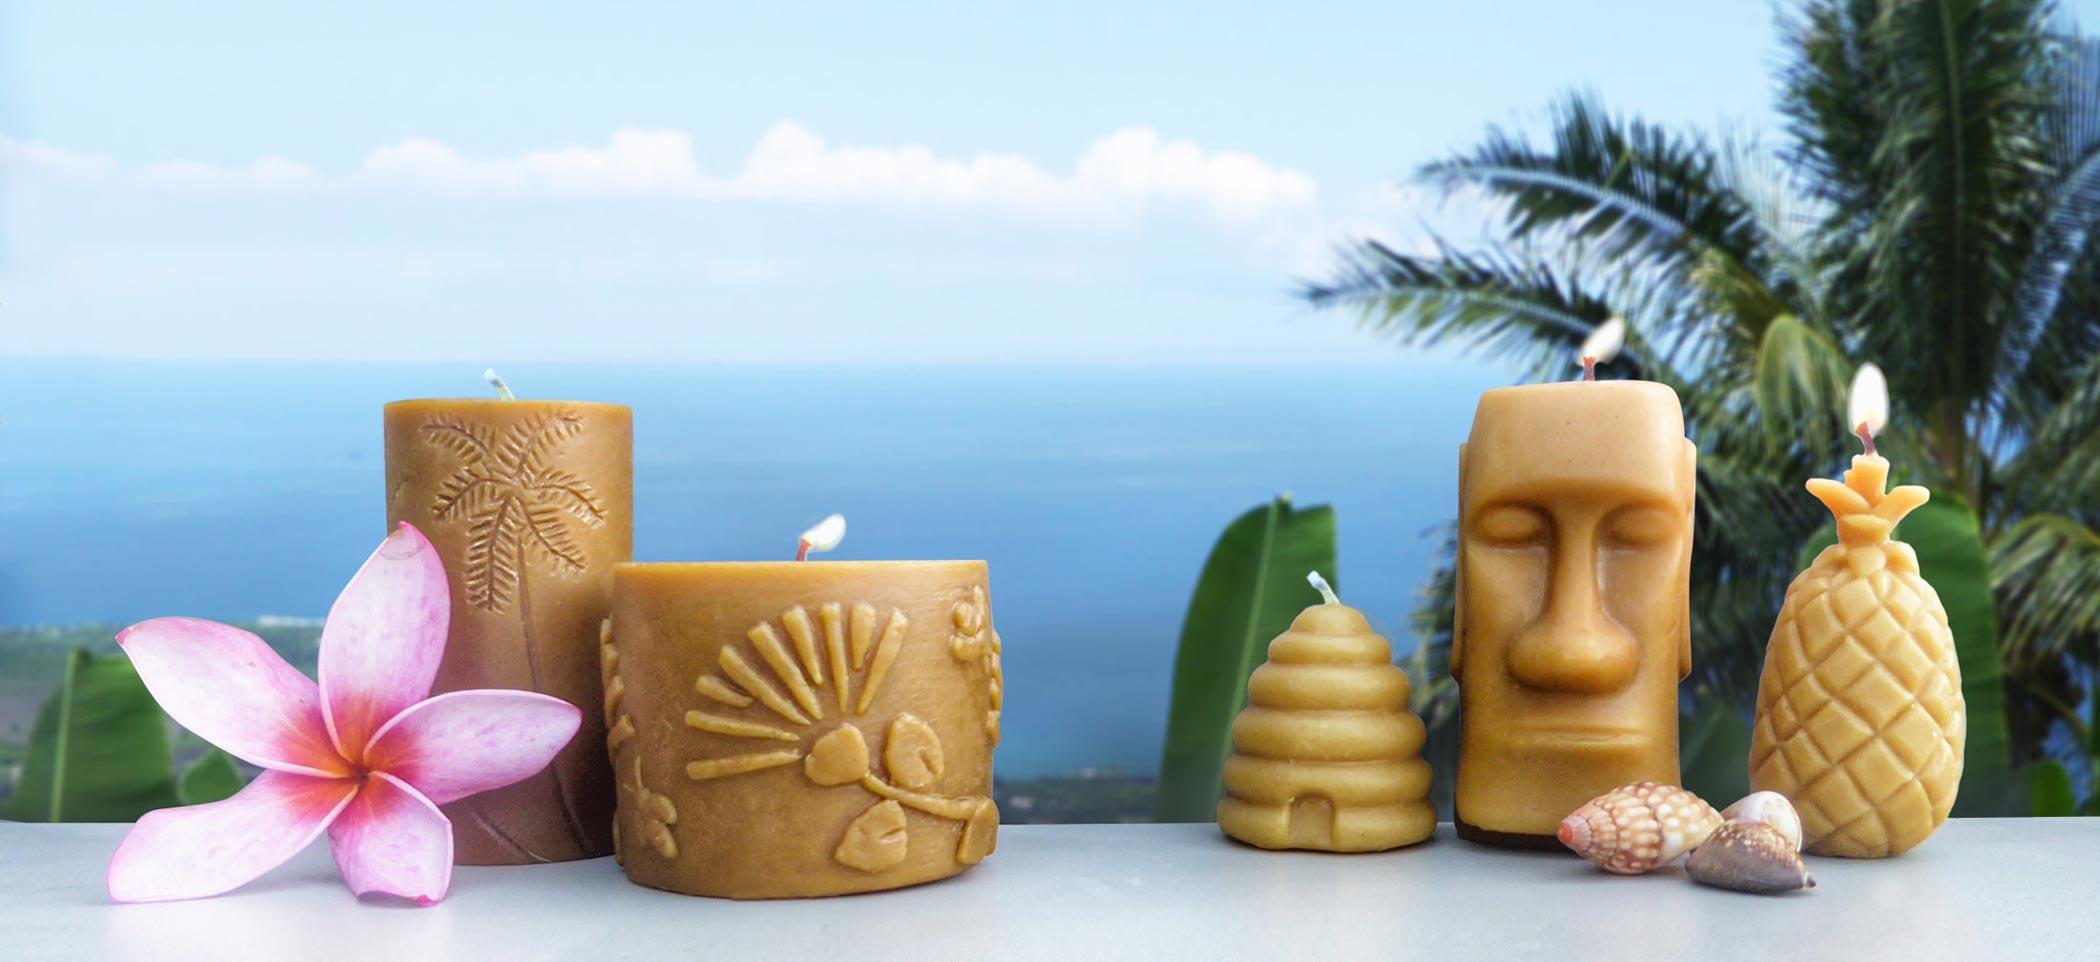 handmade beeswax cnadles from hawaii